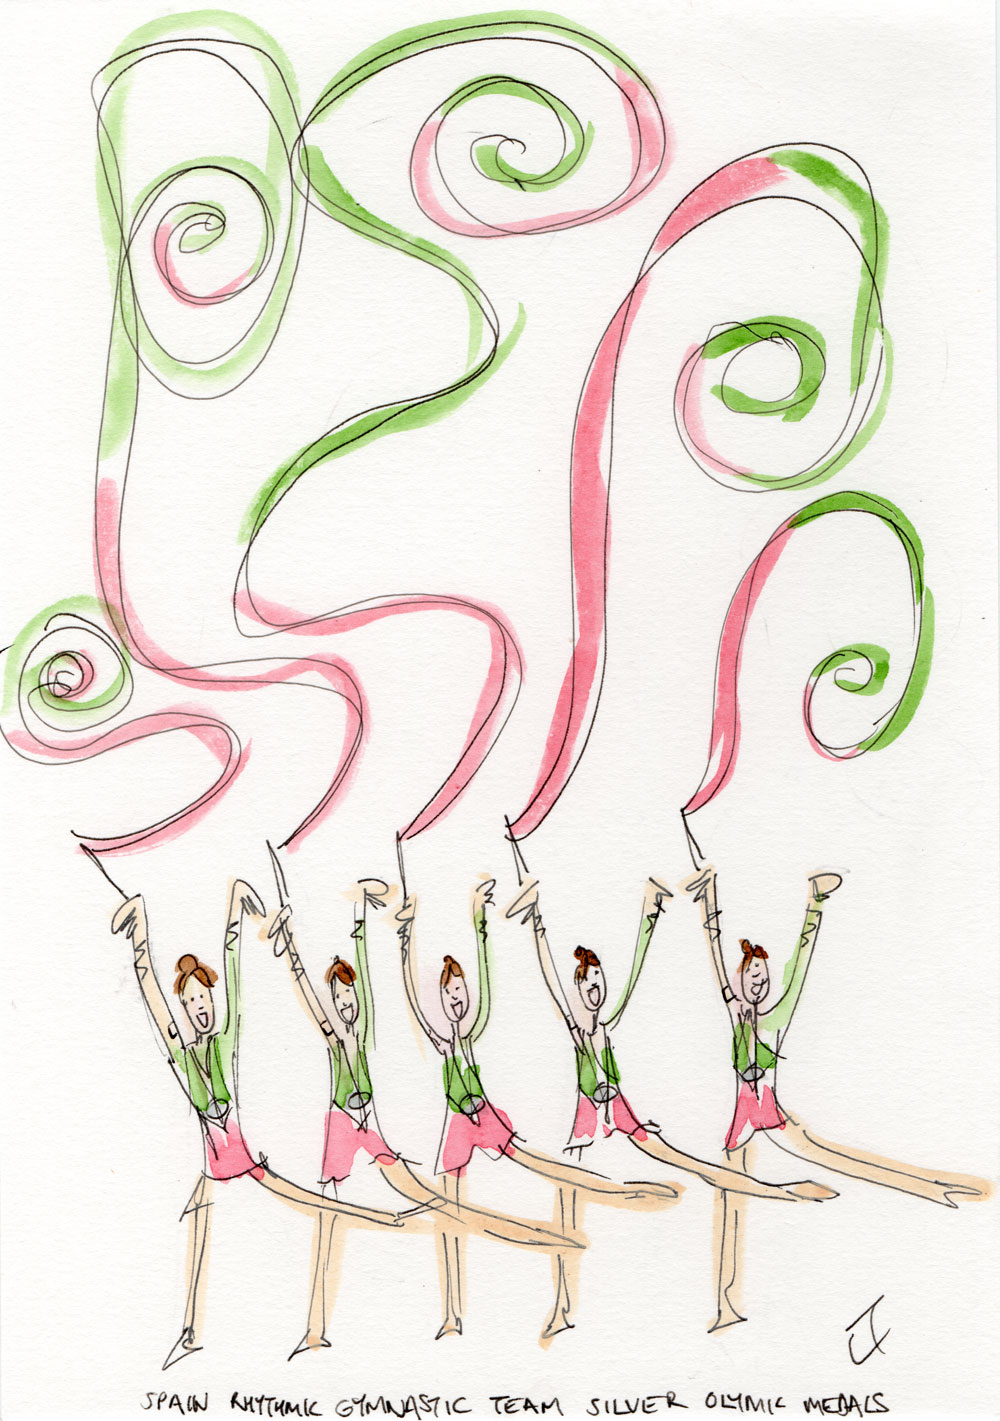 spain gymnastics team